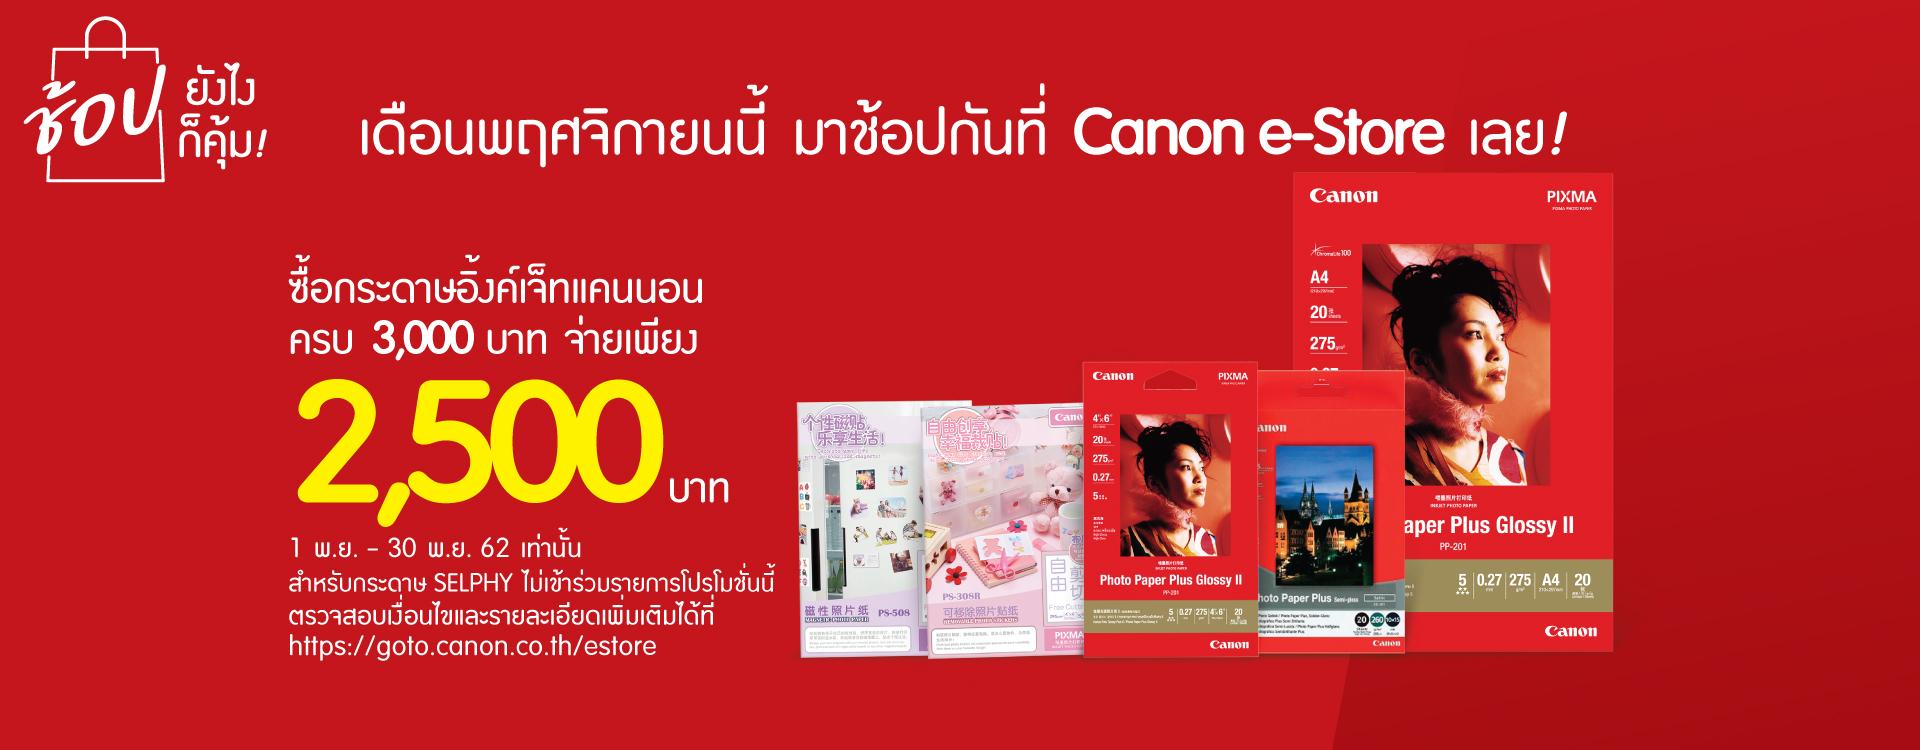 Home Canon Thailand - jp npa roblox